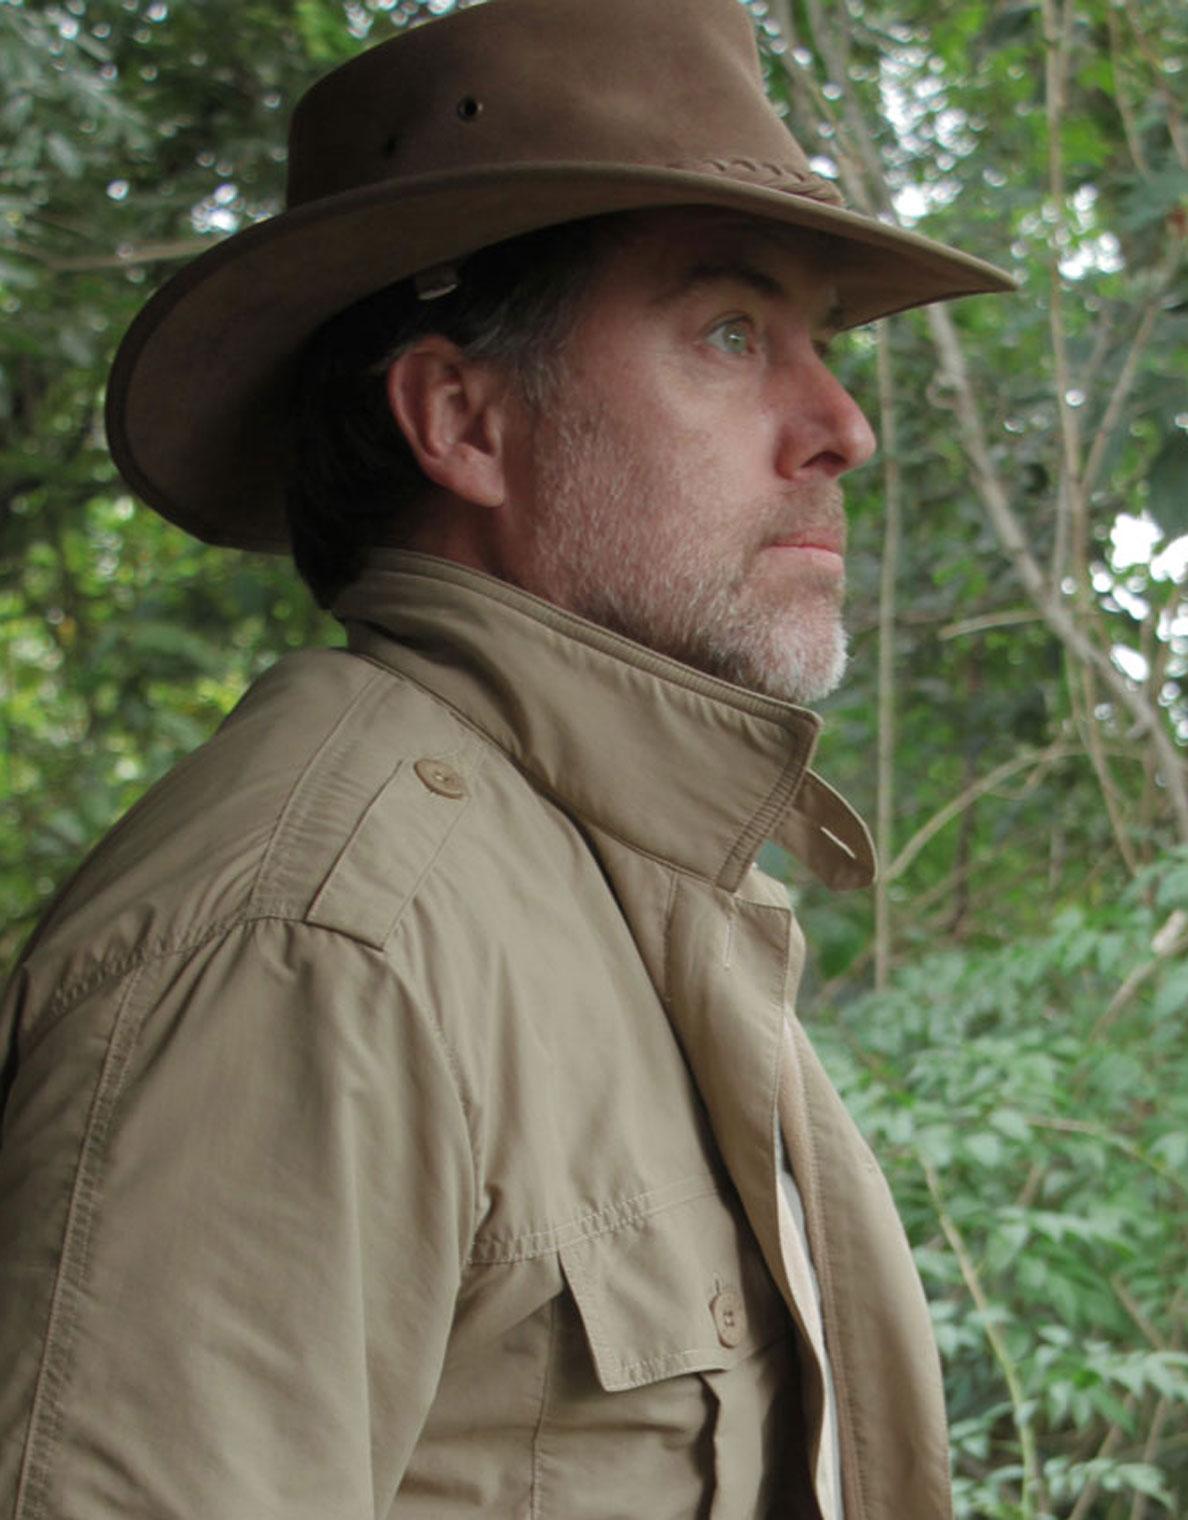 Leather Rufiji Safari Hat - pack it for the Okavango Delta.